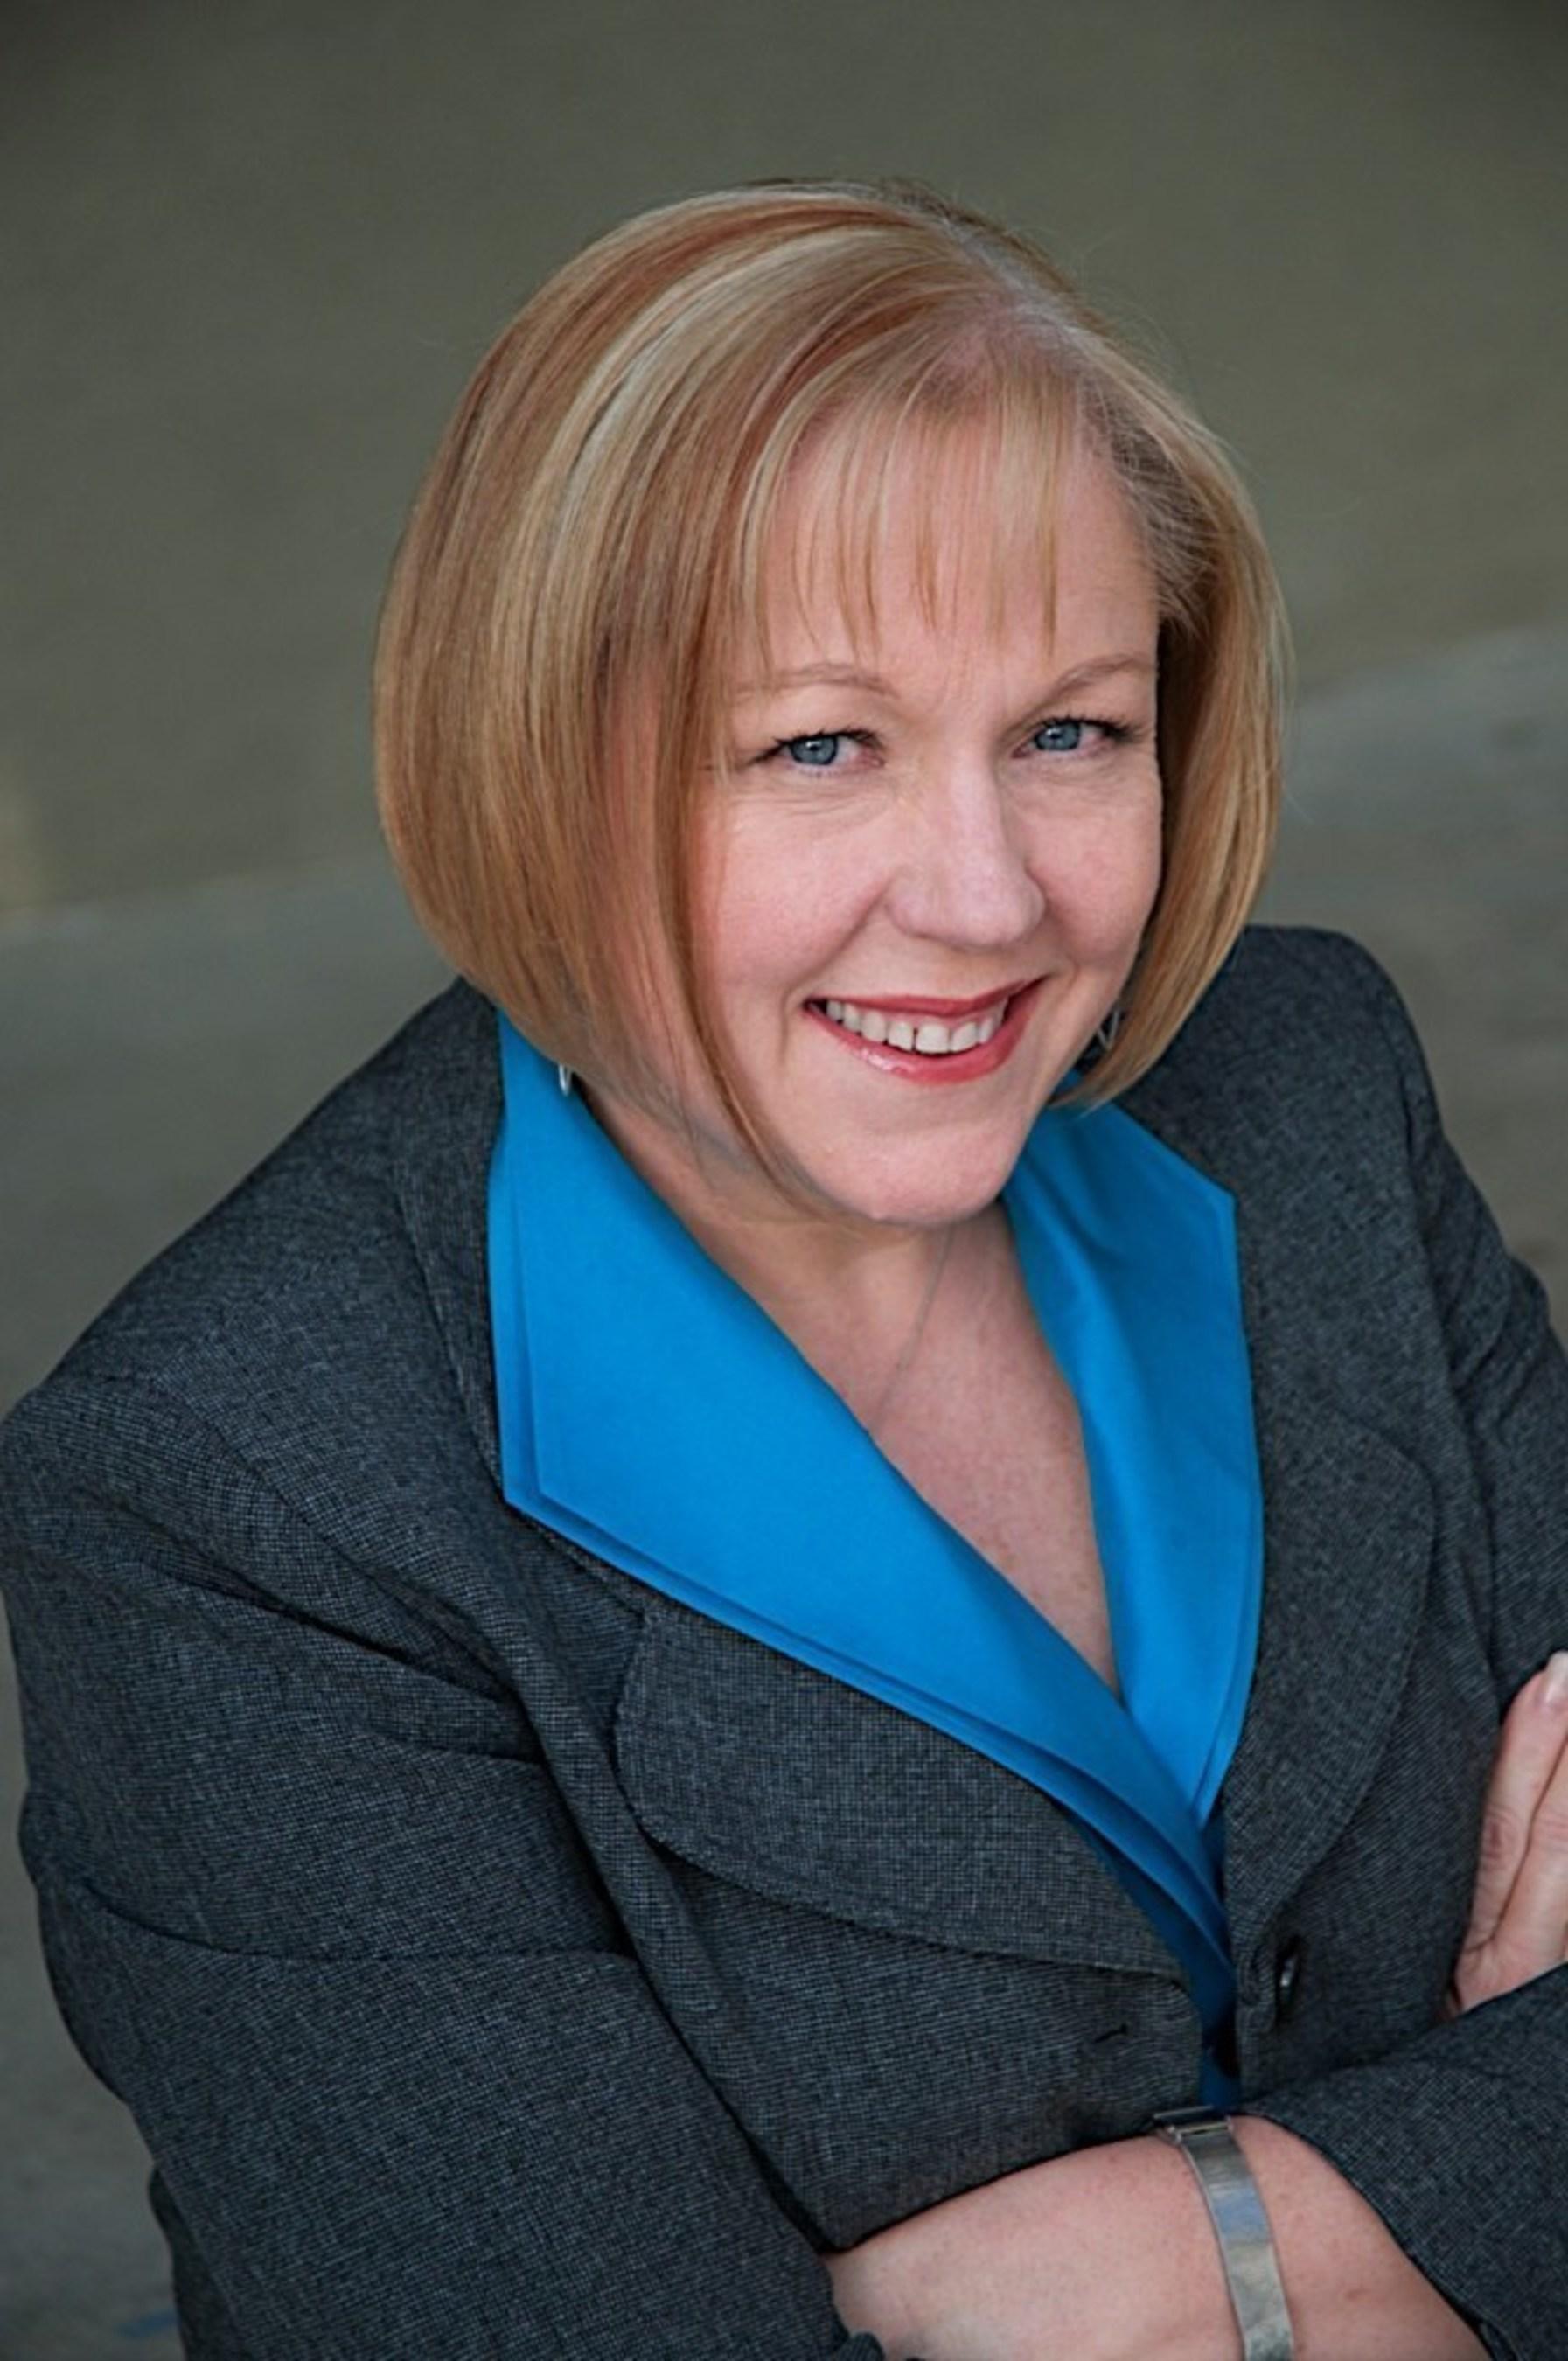 Sue Vessella Named Interim Dean of Woodbury University's School of Media, Culture & Design